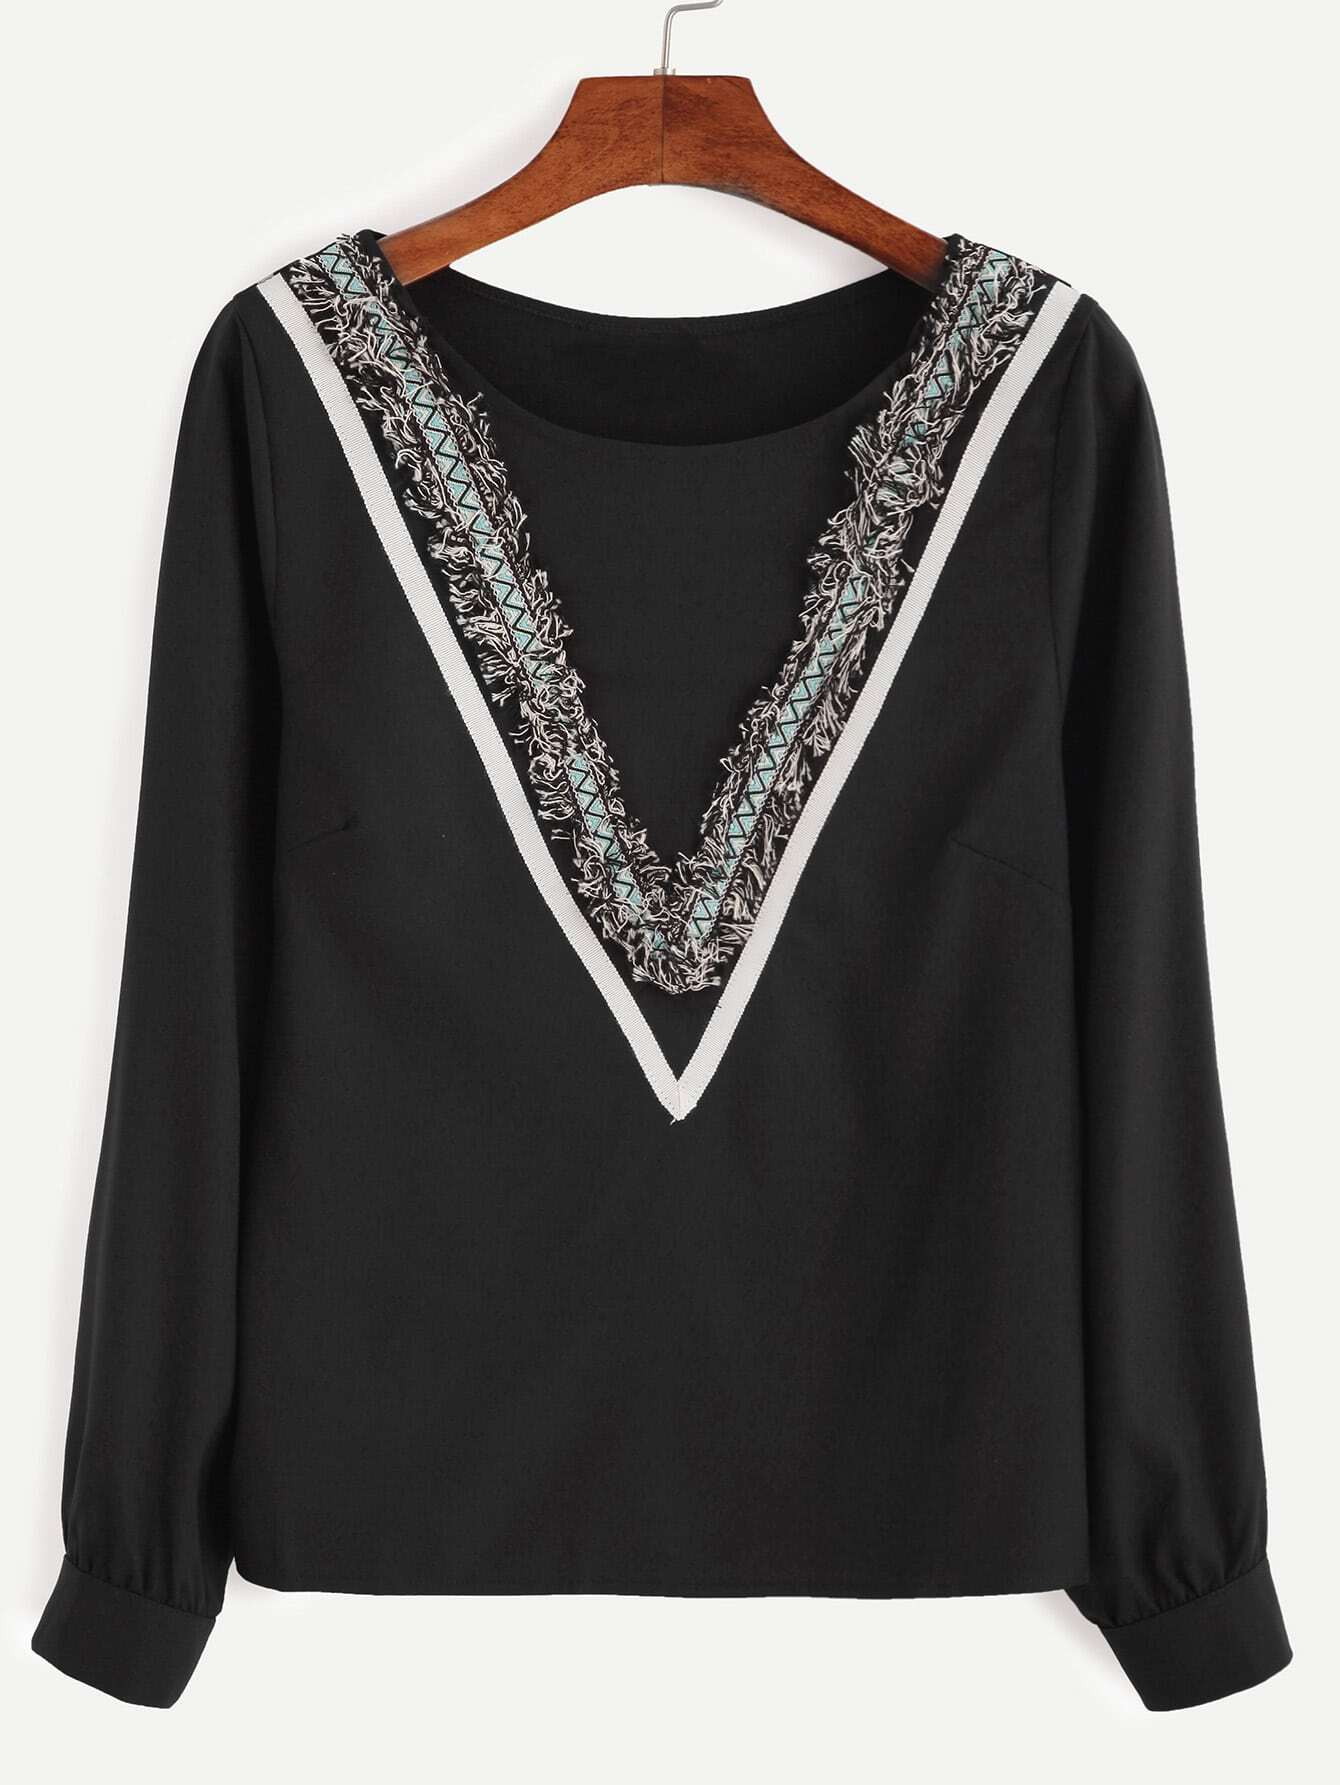 Black Embroidered Tape Detail Fringe Blouse blouse160928301